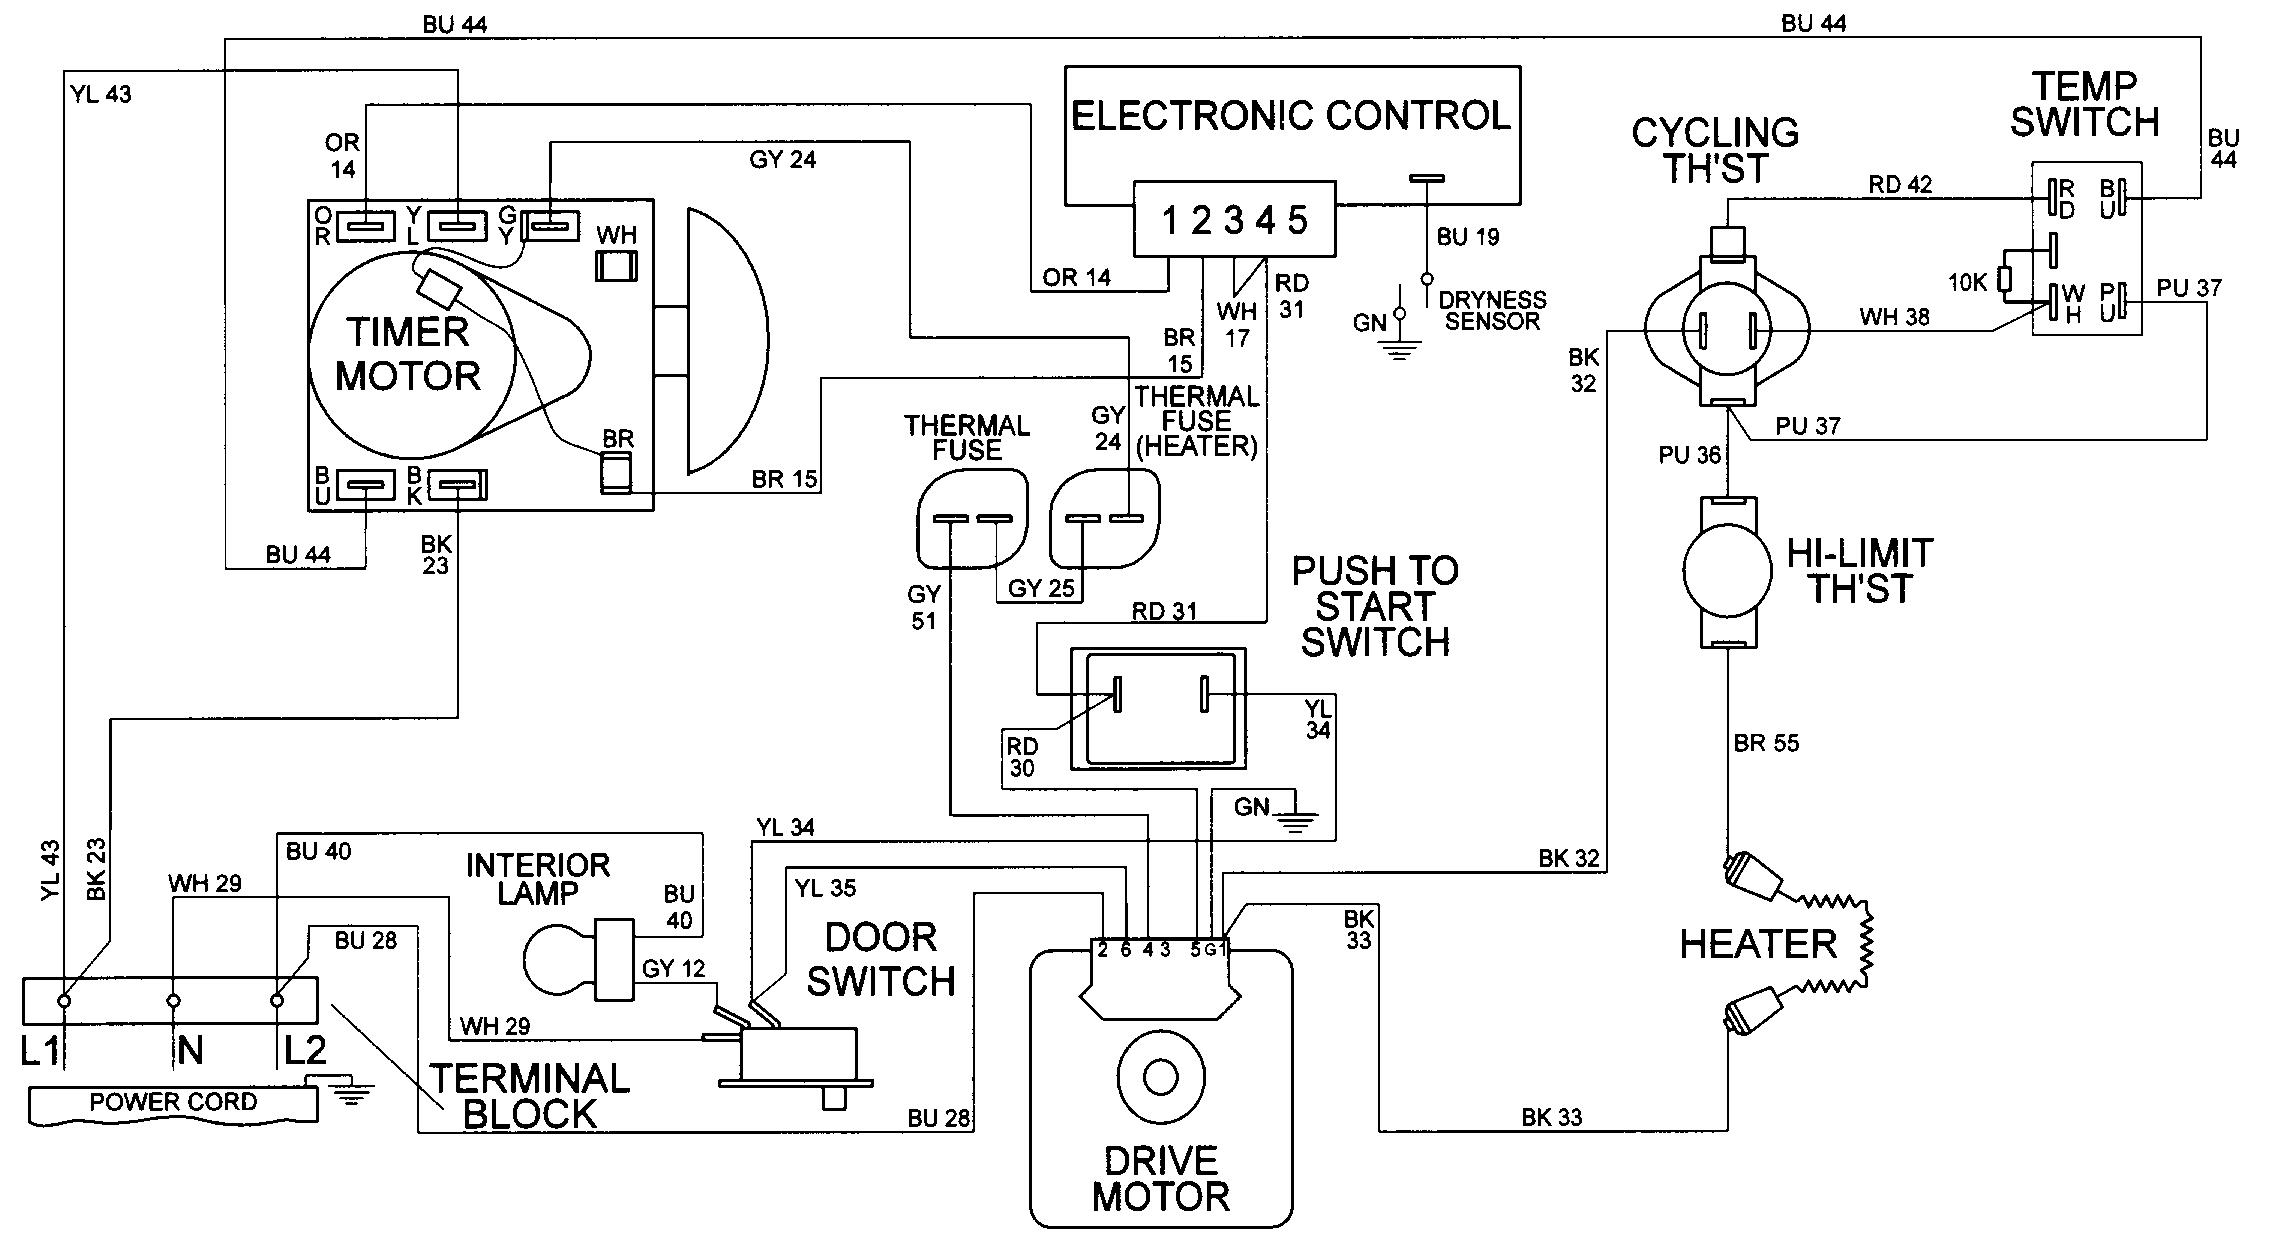 small resolution of maytag mde9606azw wiring information diagram